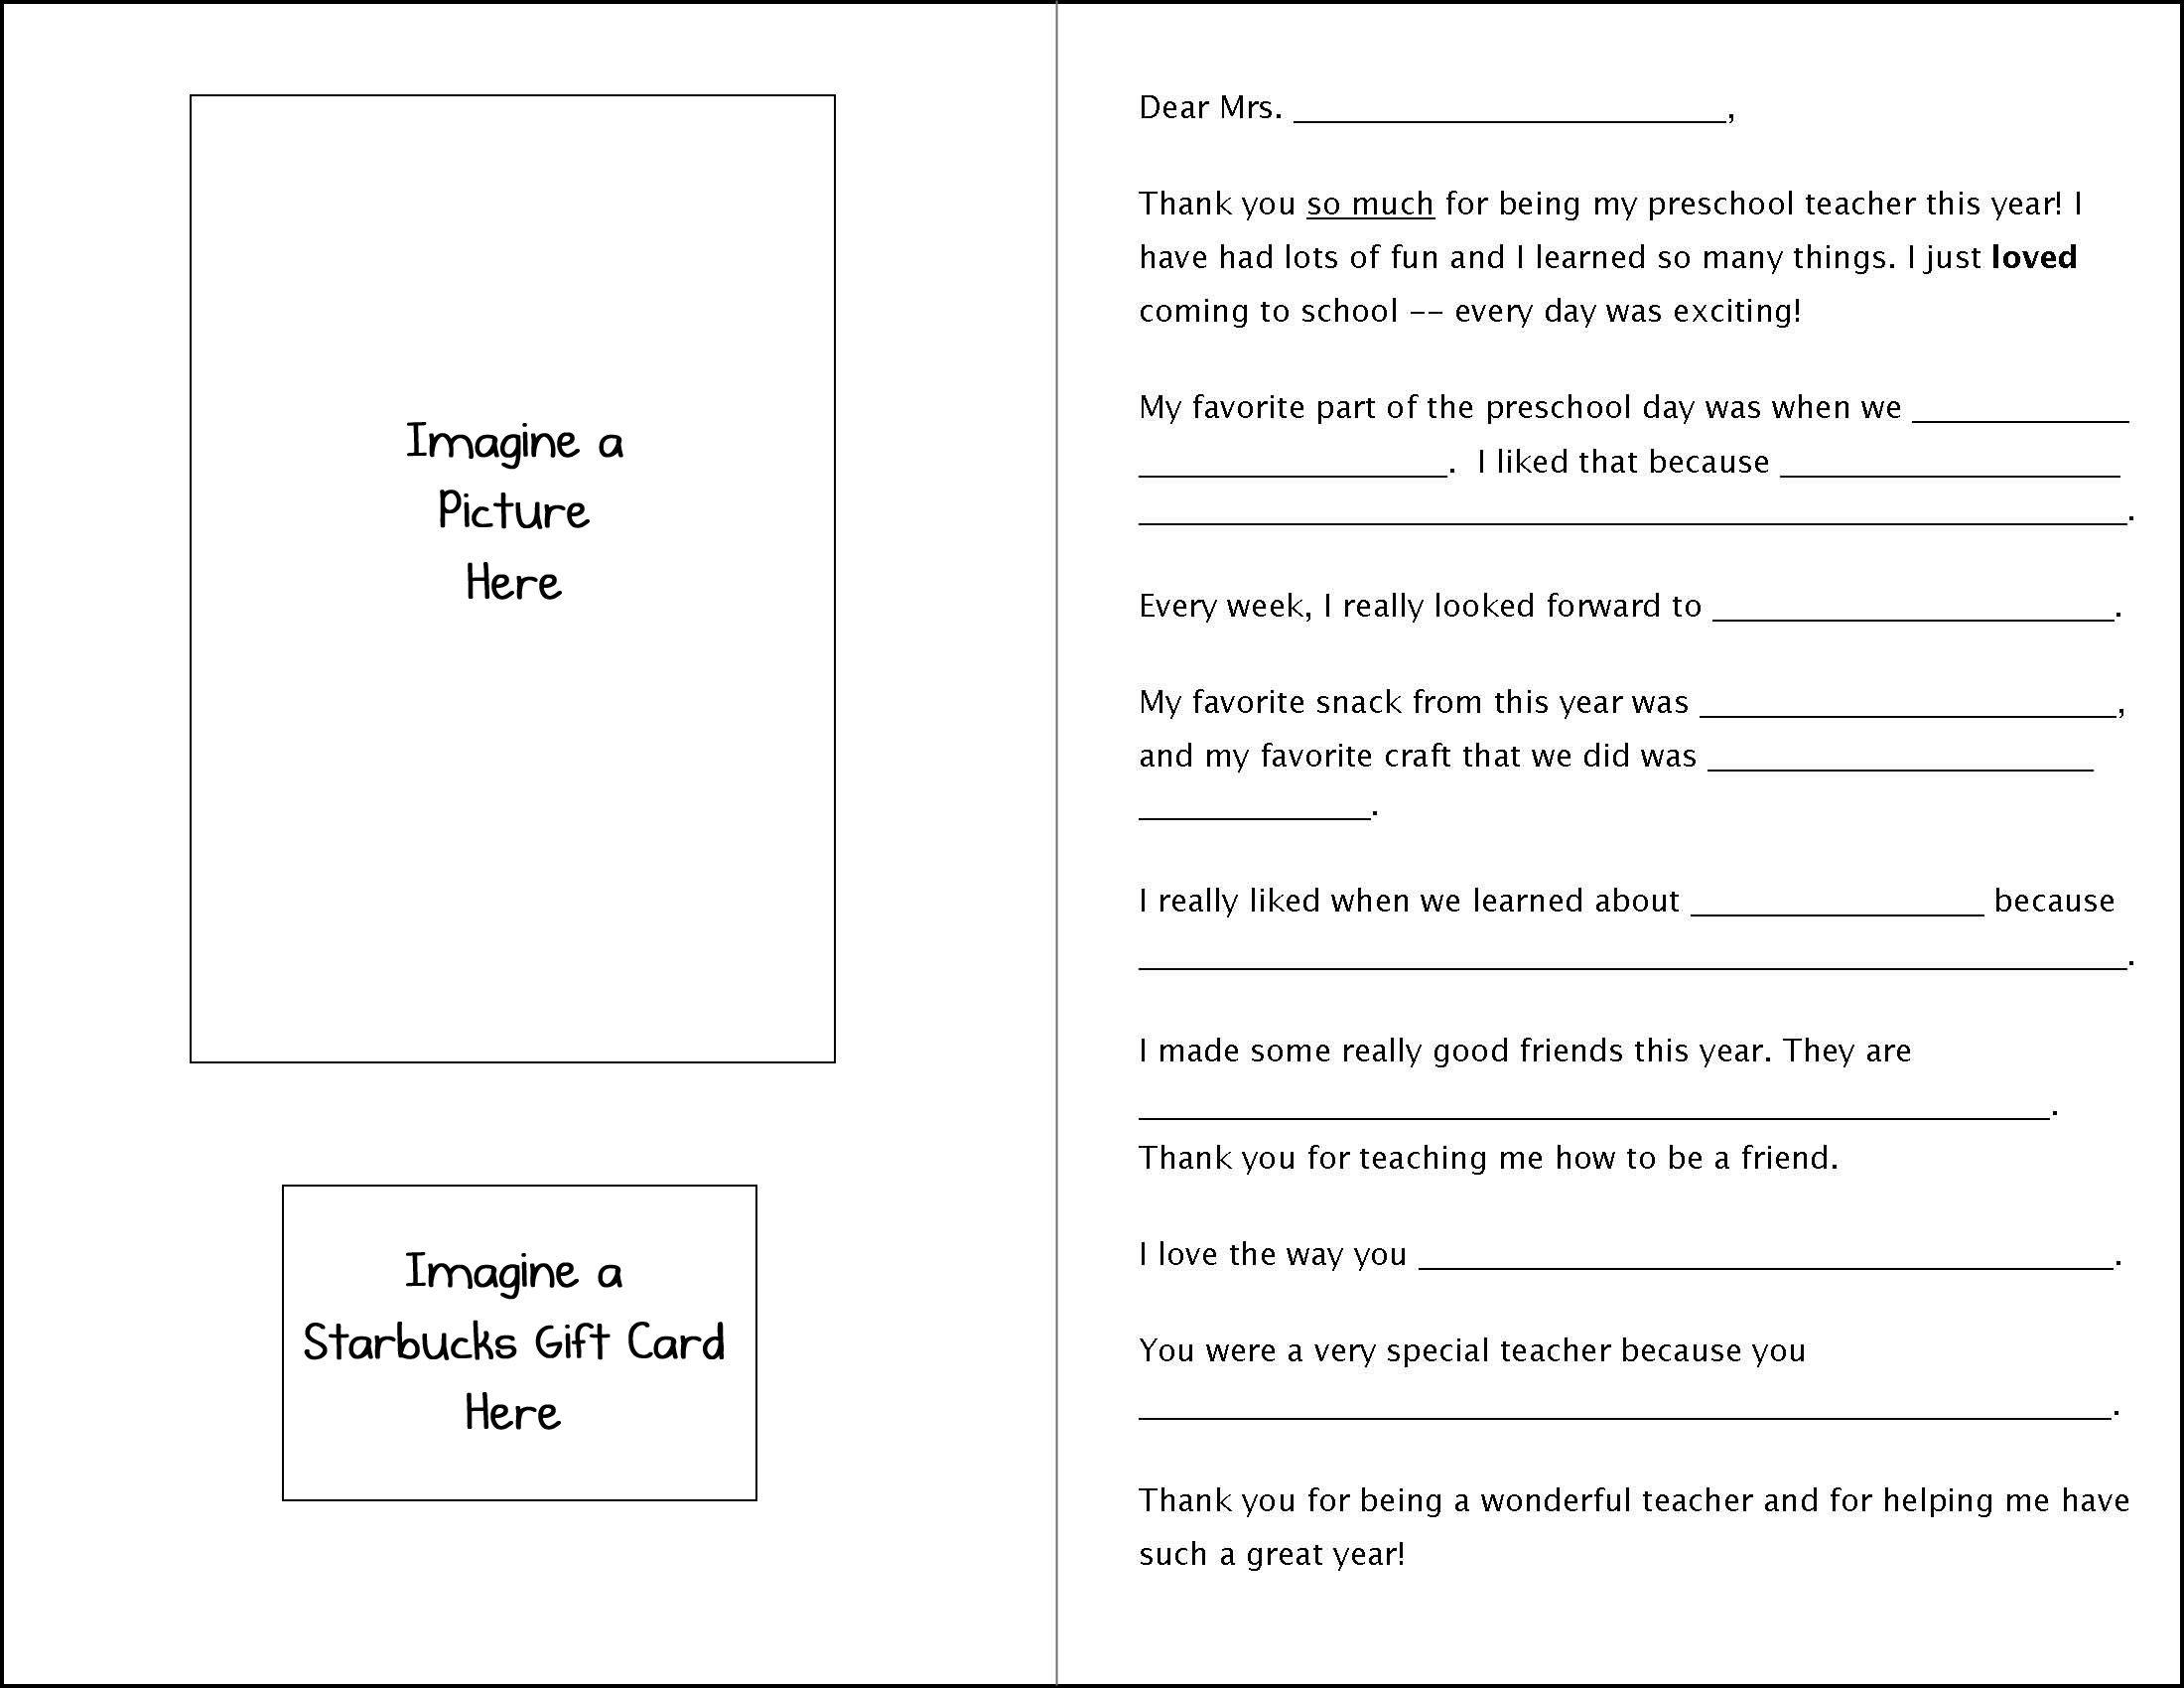 Fill In The Blank Teacher Appreciation Letter